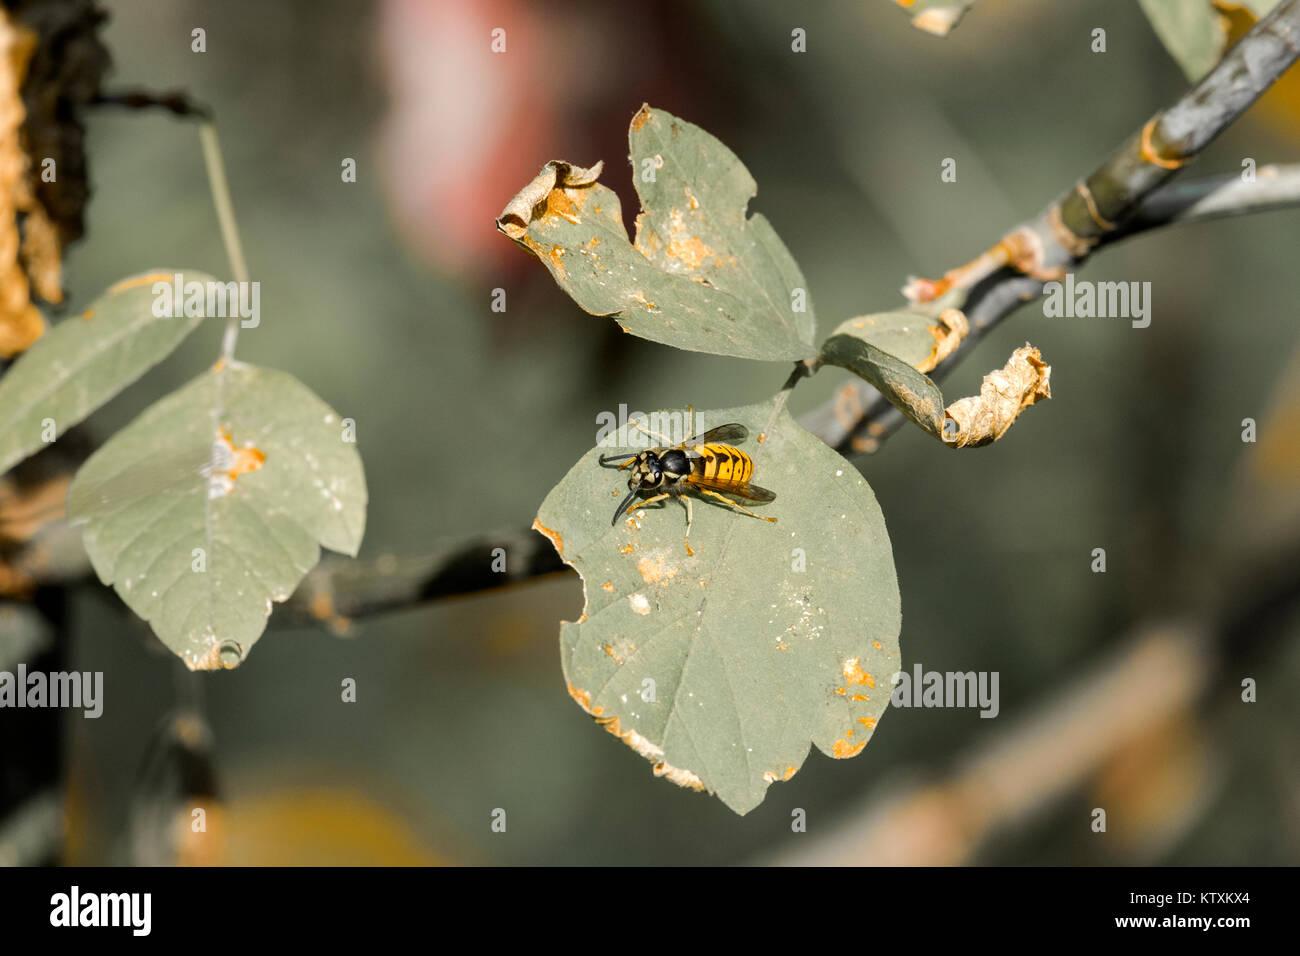 European wasp crawling on the leaf of a tree (Vespula vulgaris) - Stock Image